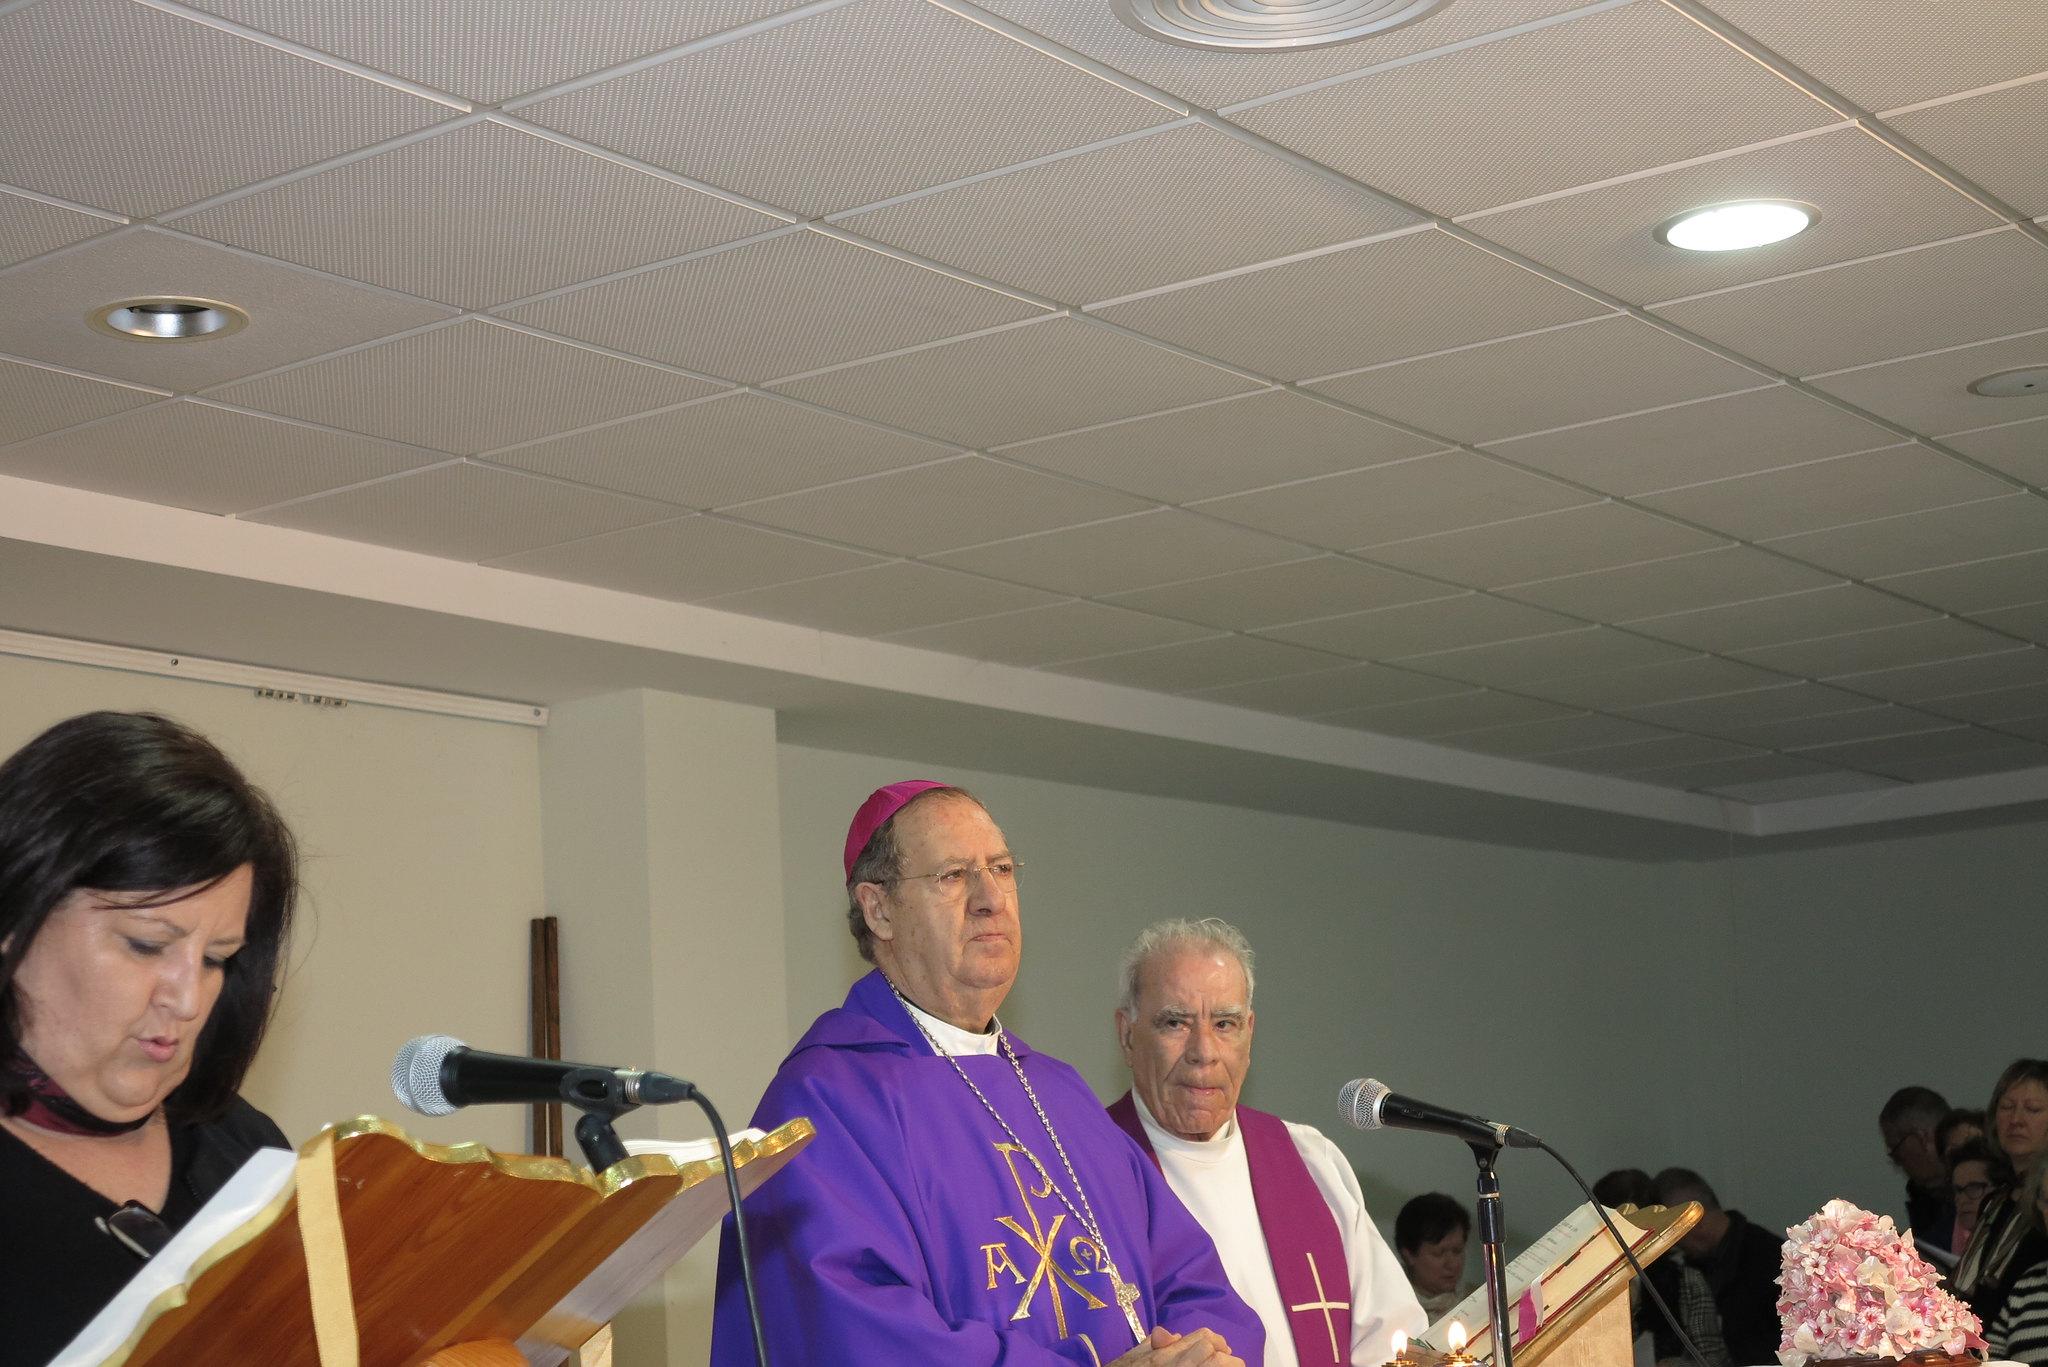 (2016-02-13) - Inauguración Virgen de Lourdes, La Molineta - Archivo La Molineta 2 (02)